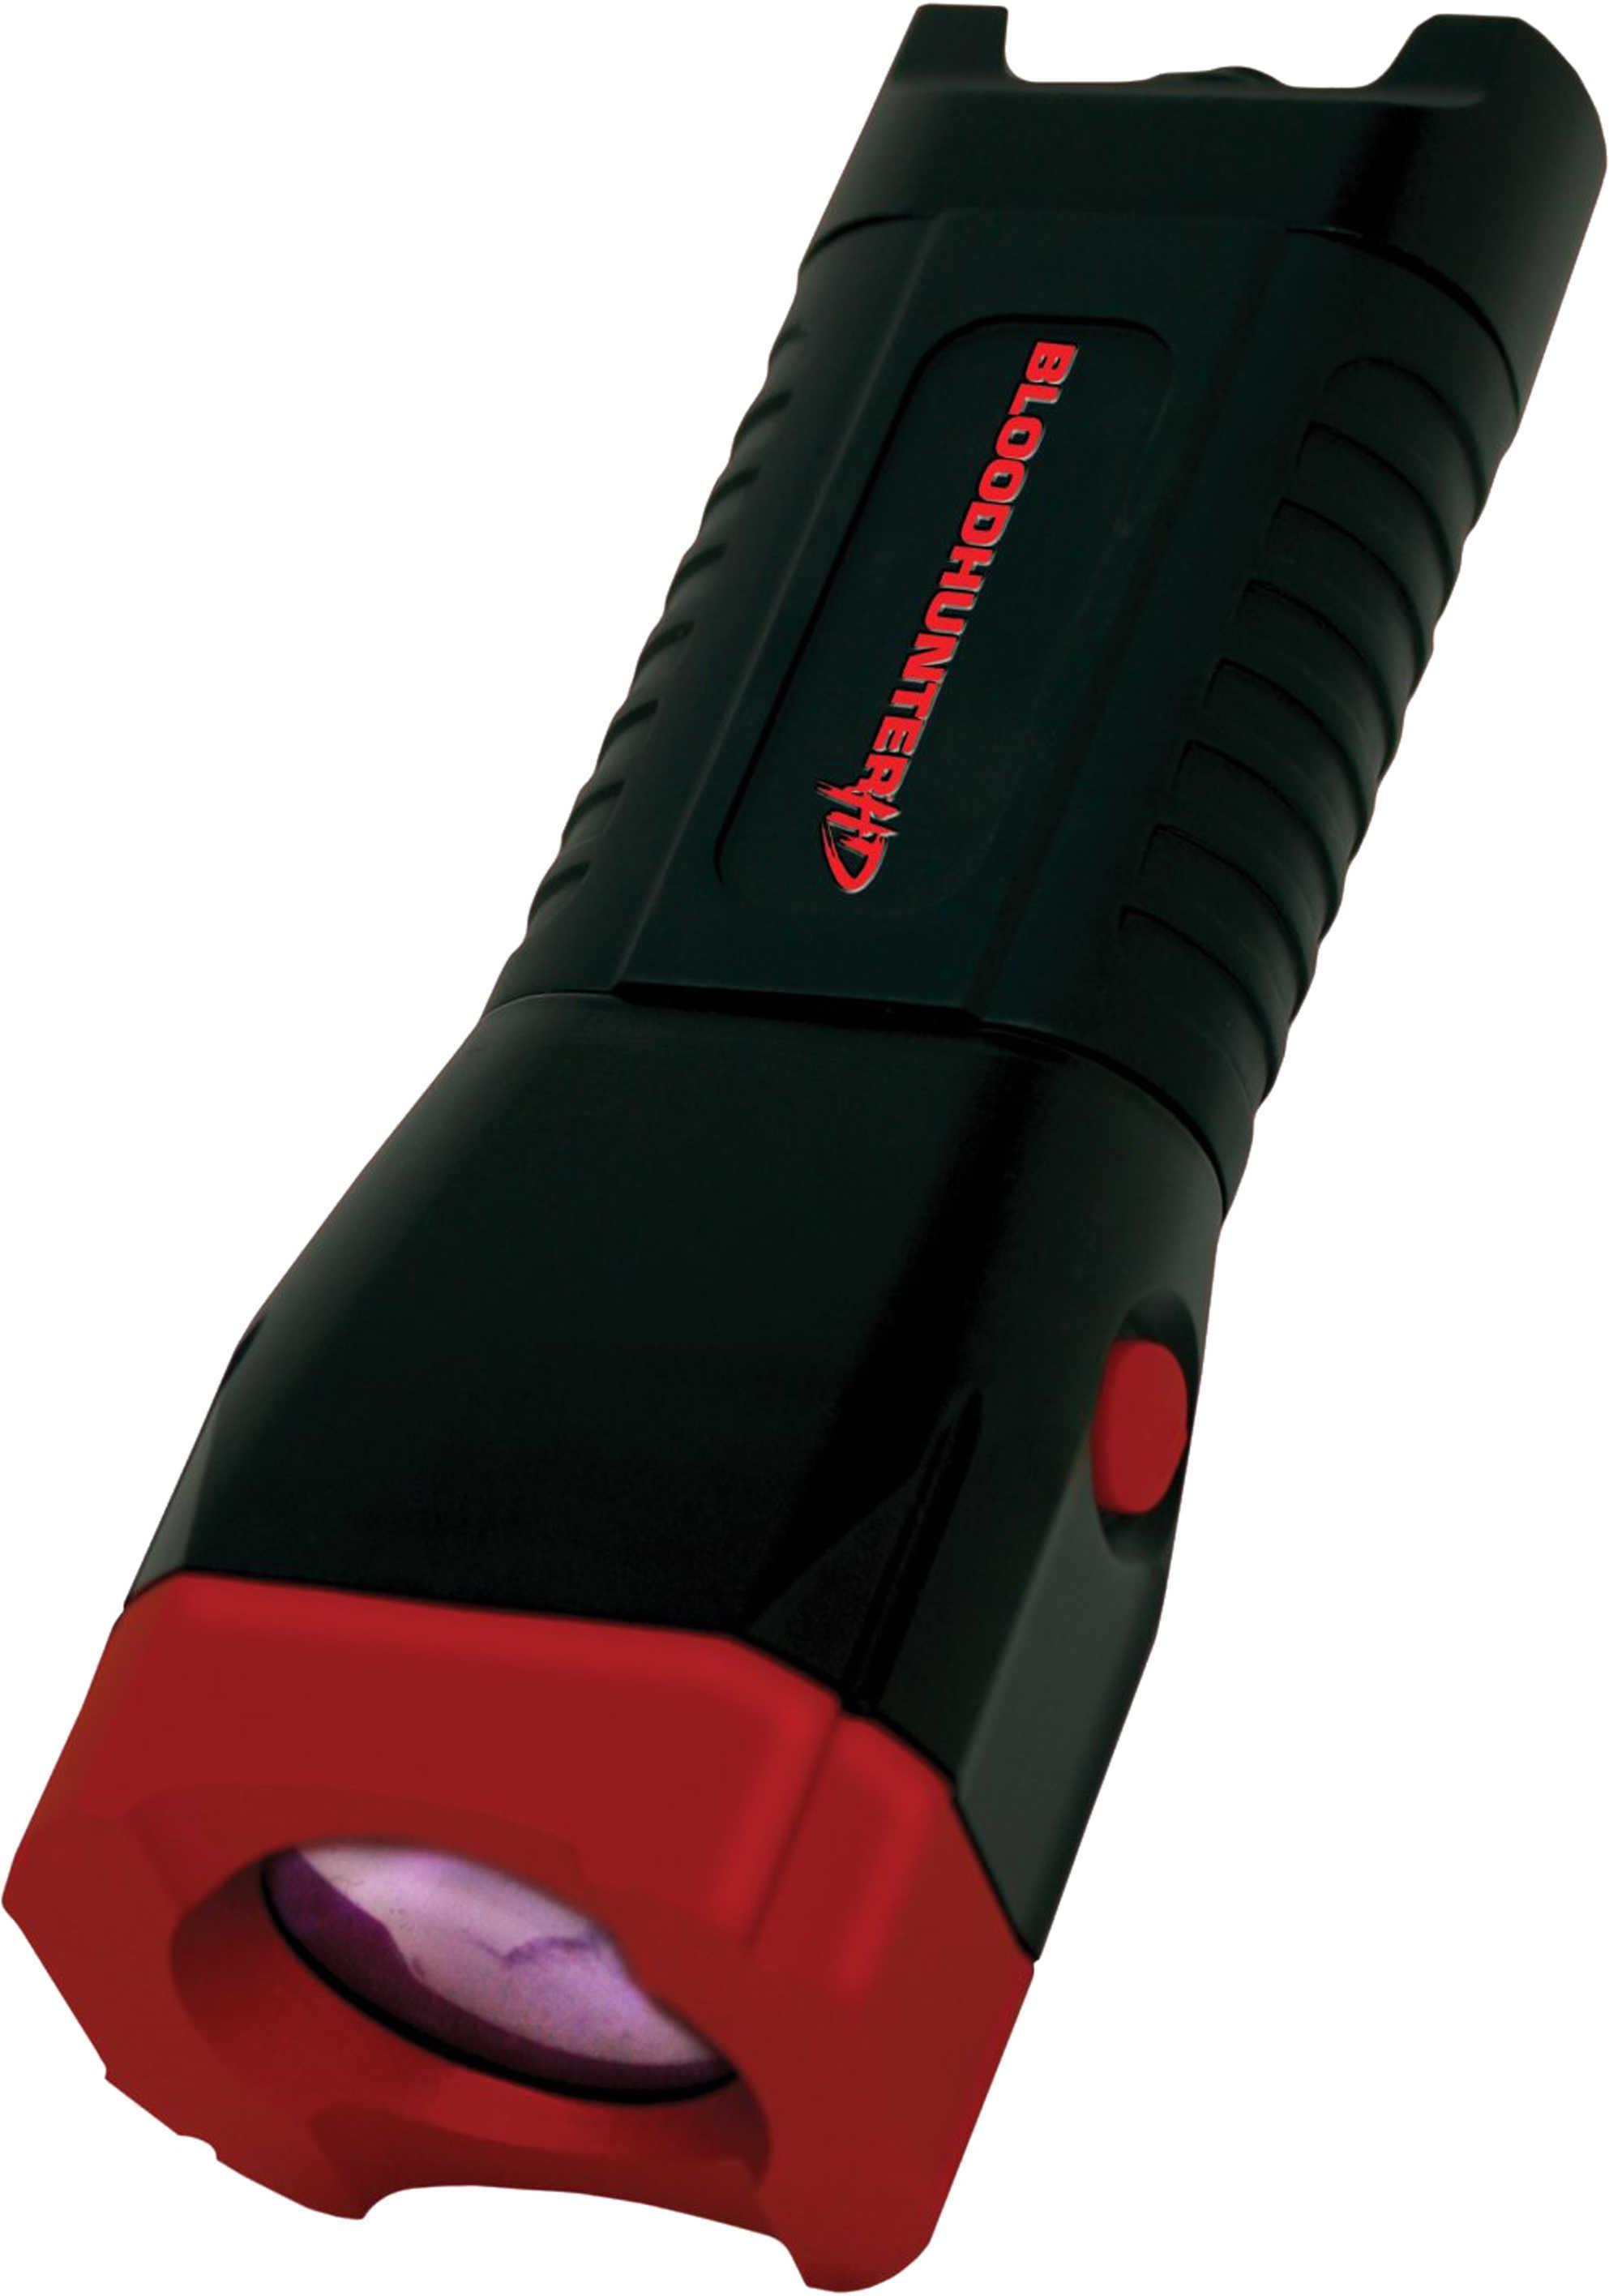 Primos Bloodhunter HD Flashlight Model: 61107